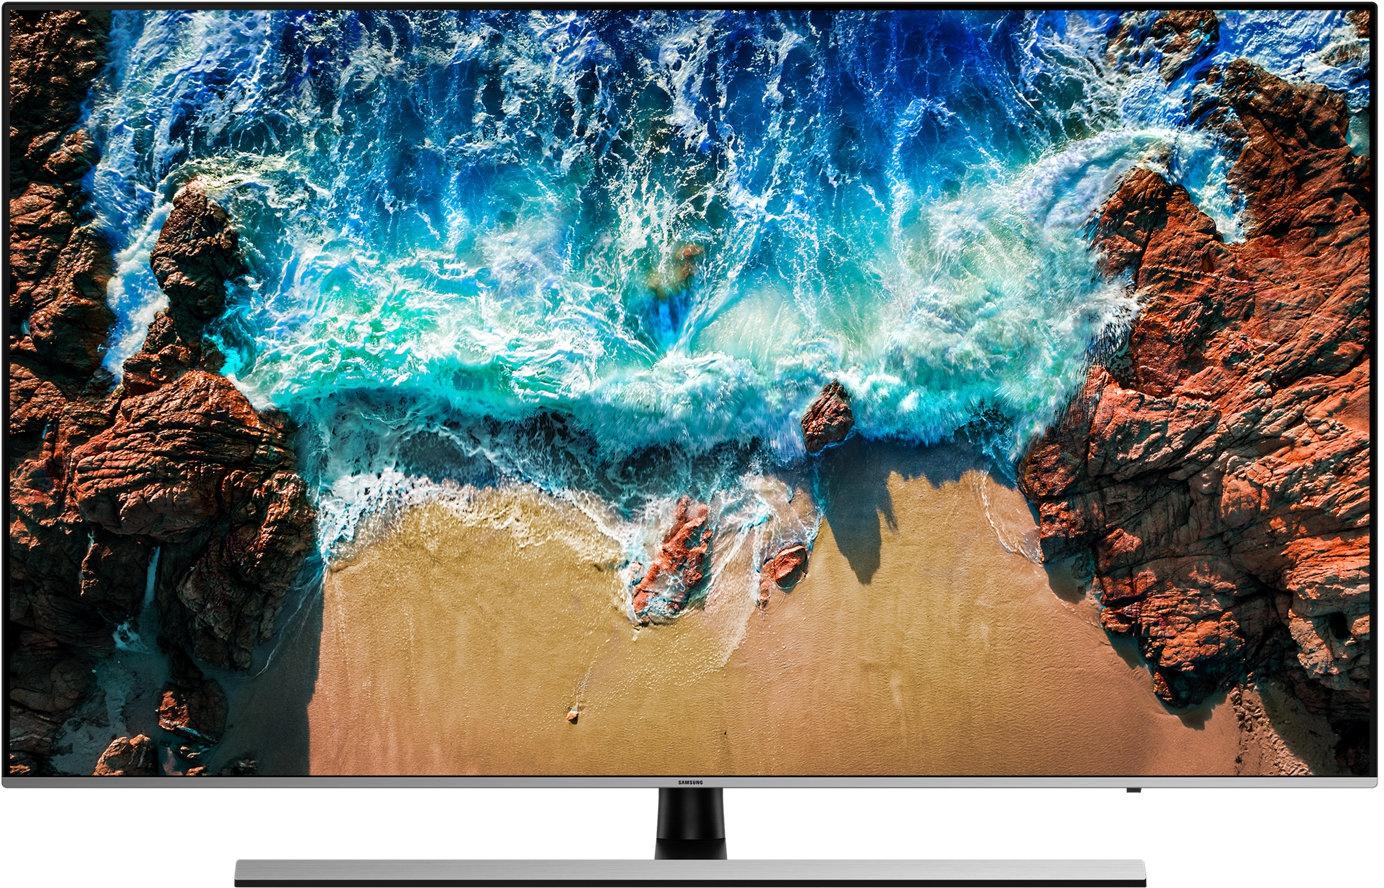 Samsung UE49NU8000 (49'' 4K UHD TV)